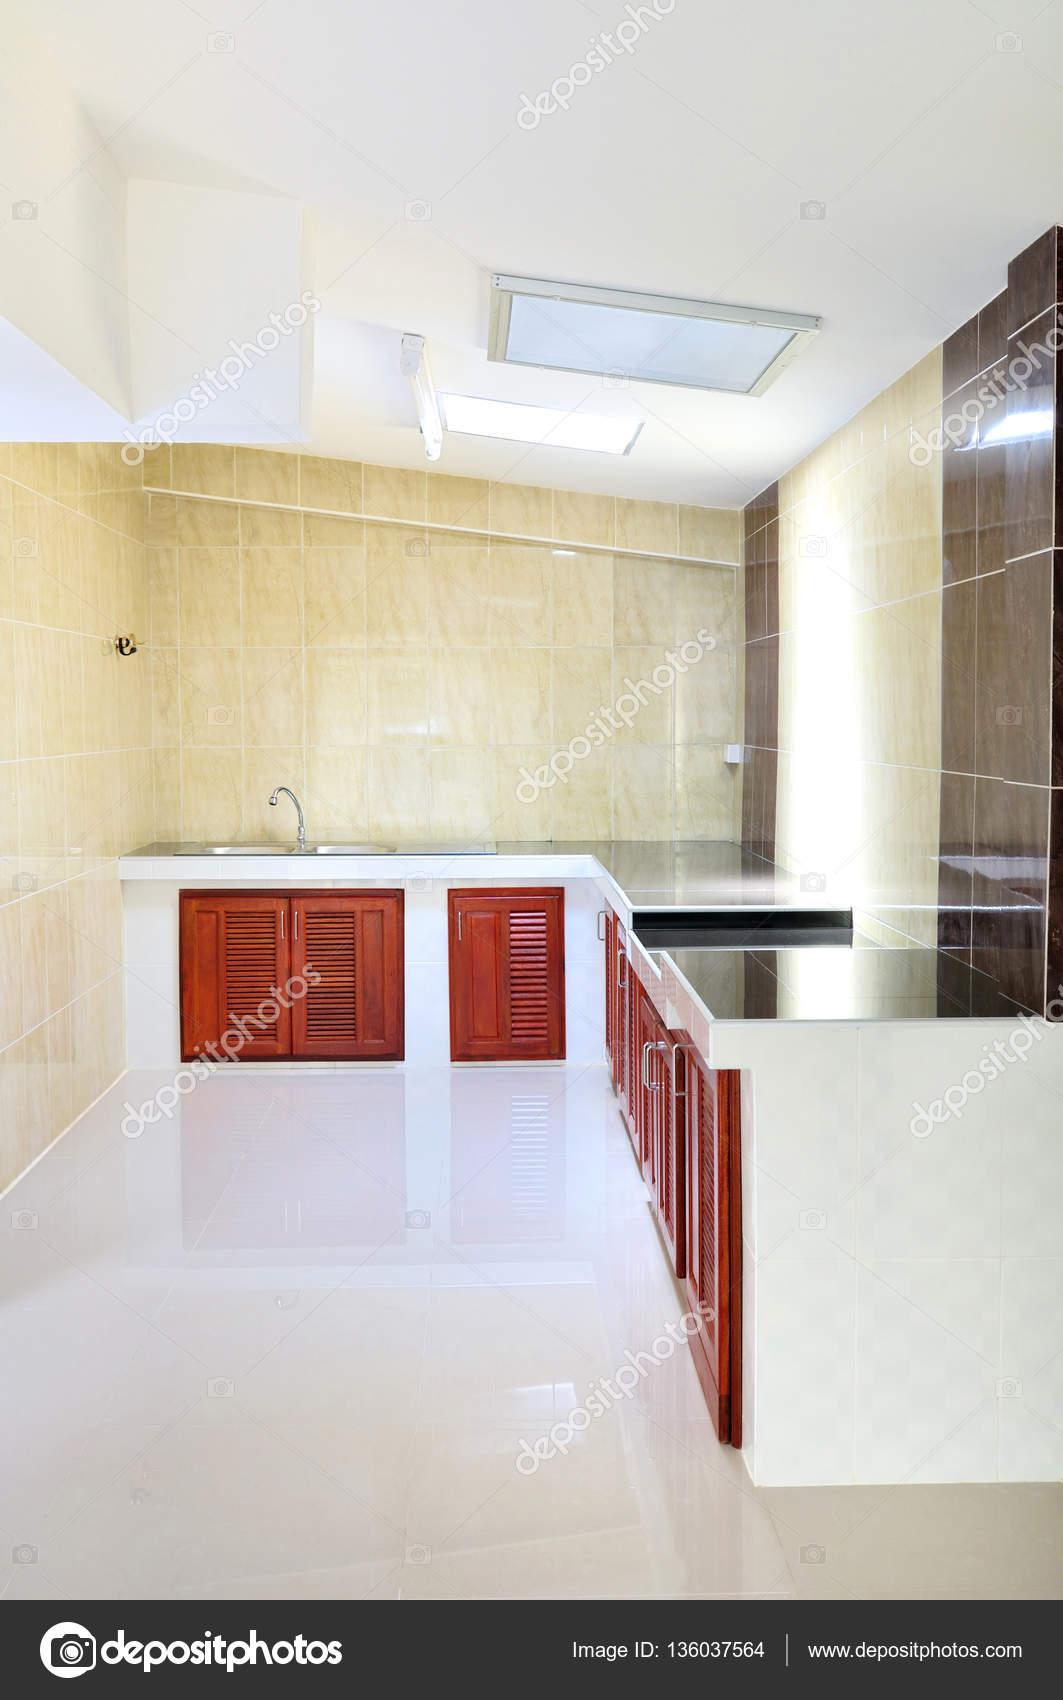 leere konkrete Theke Küche mit Beige Wandfliese — Stockfoto ...